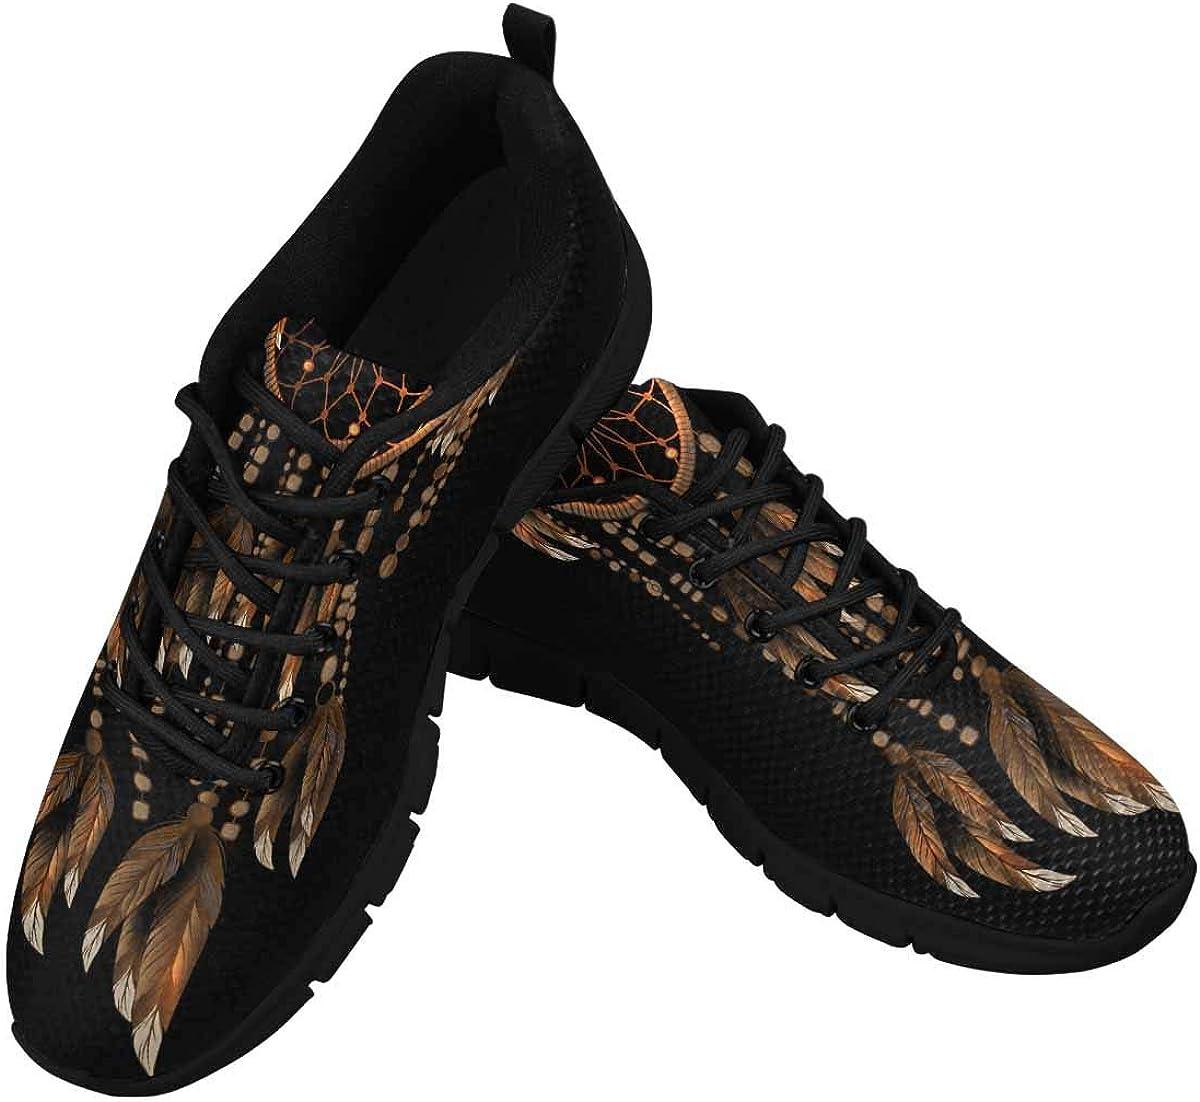 InterestPrint Dreamcatcher Pattern Women's Lace Up Running Comfort Sports Sneakers